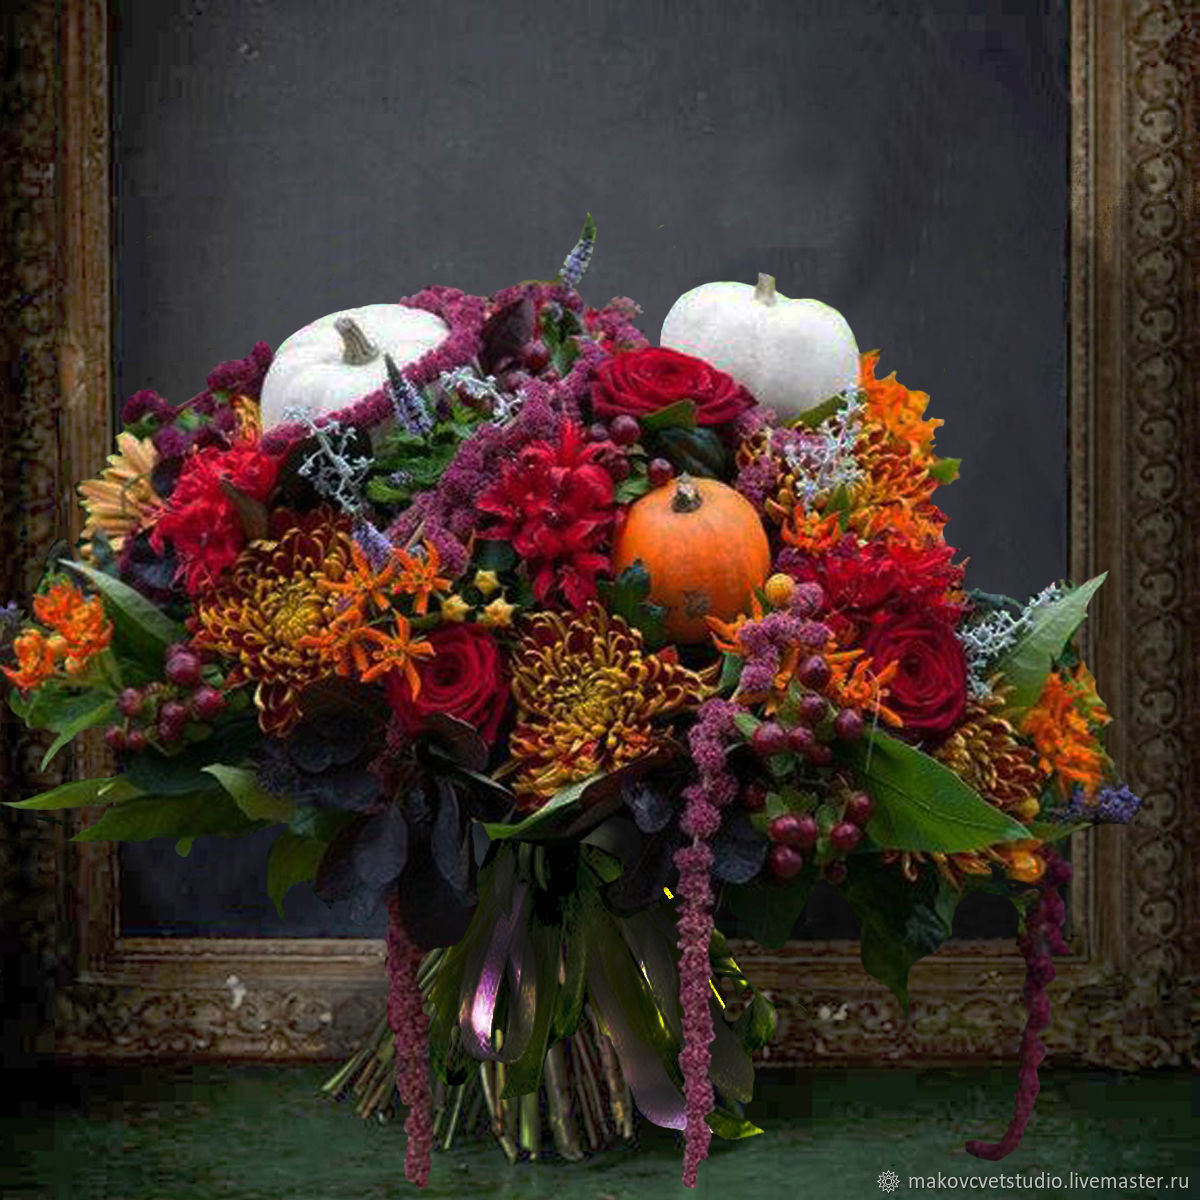 Autumn kiss a bouquet of flowers shop online on livemaster with autumn kiss a bouquet of flowers makovcvetstudio online shopping on my izmirmasajfo